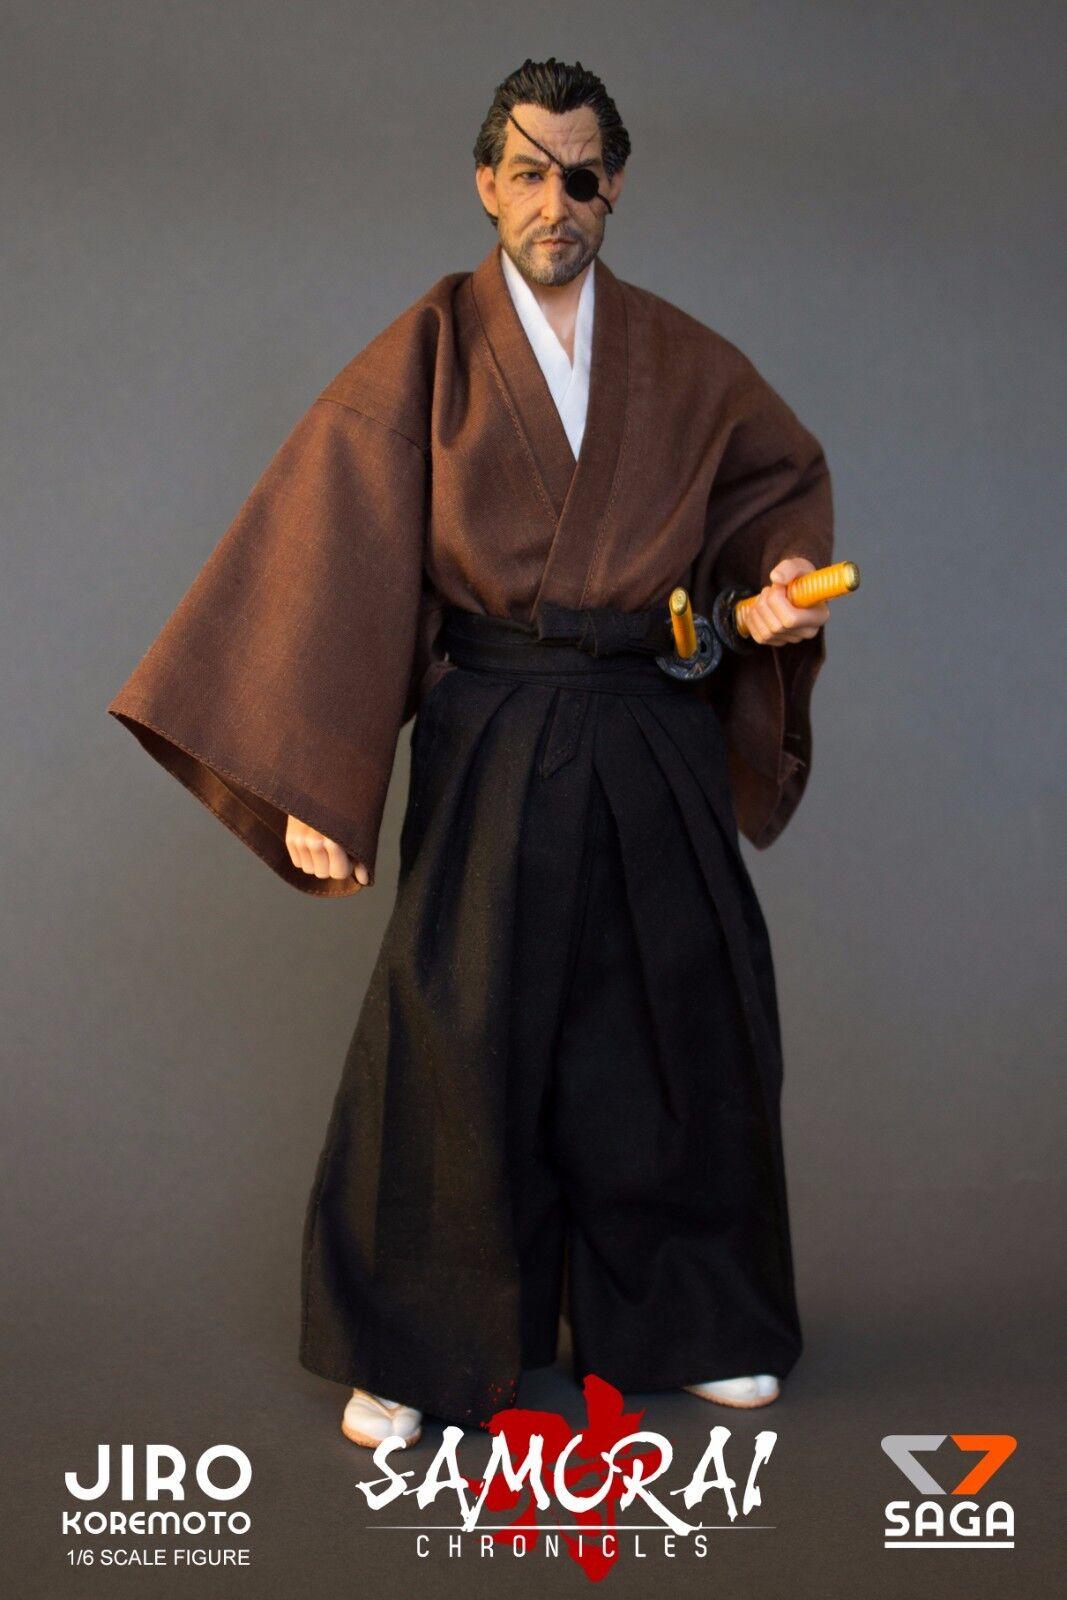 Jiro Koremoto 1/6 Scale Figure Samurai Chronicles by 7 Saga Figures